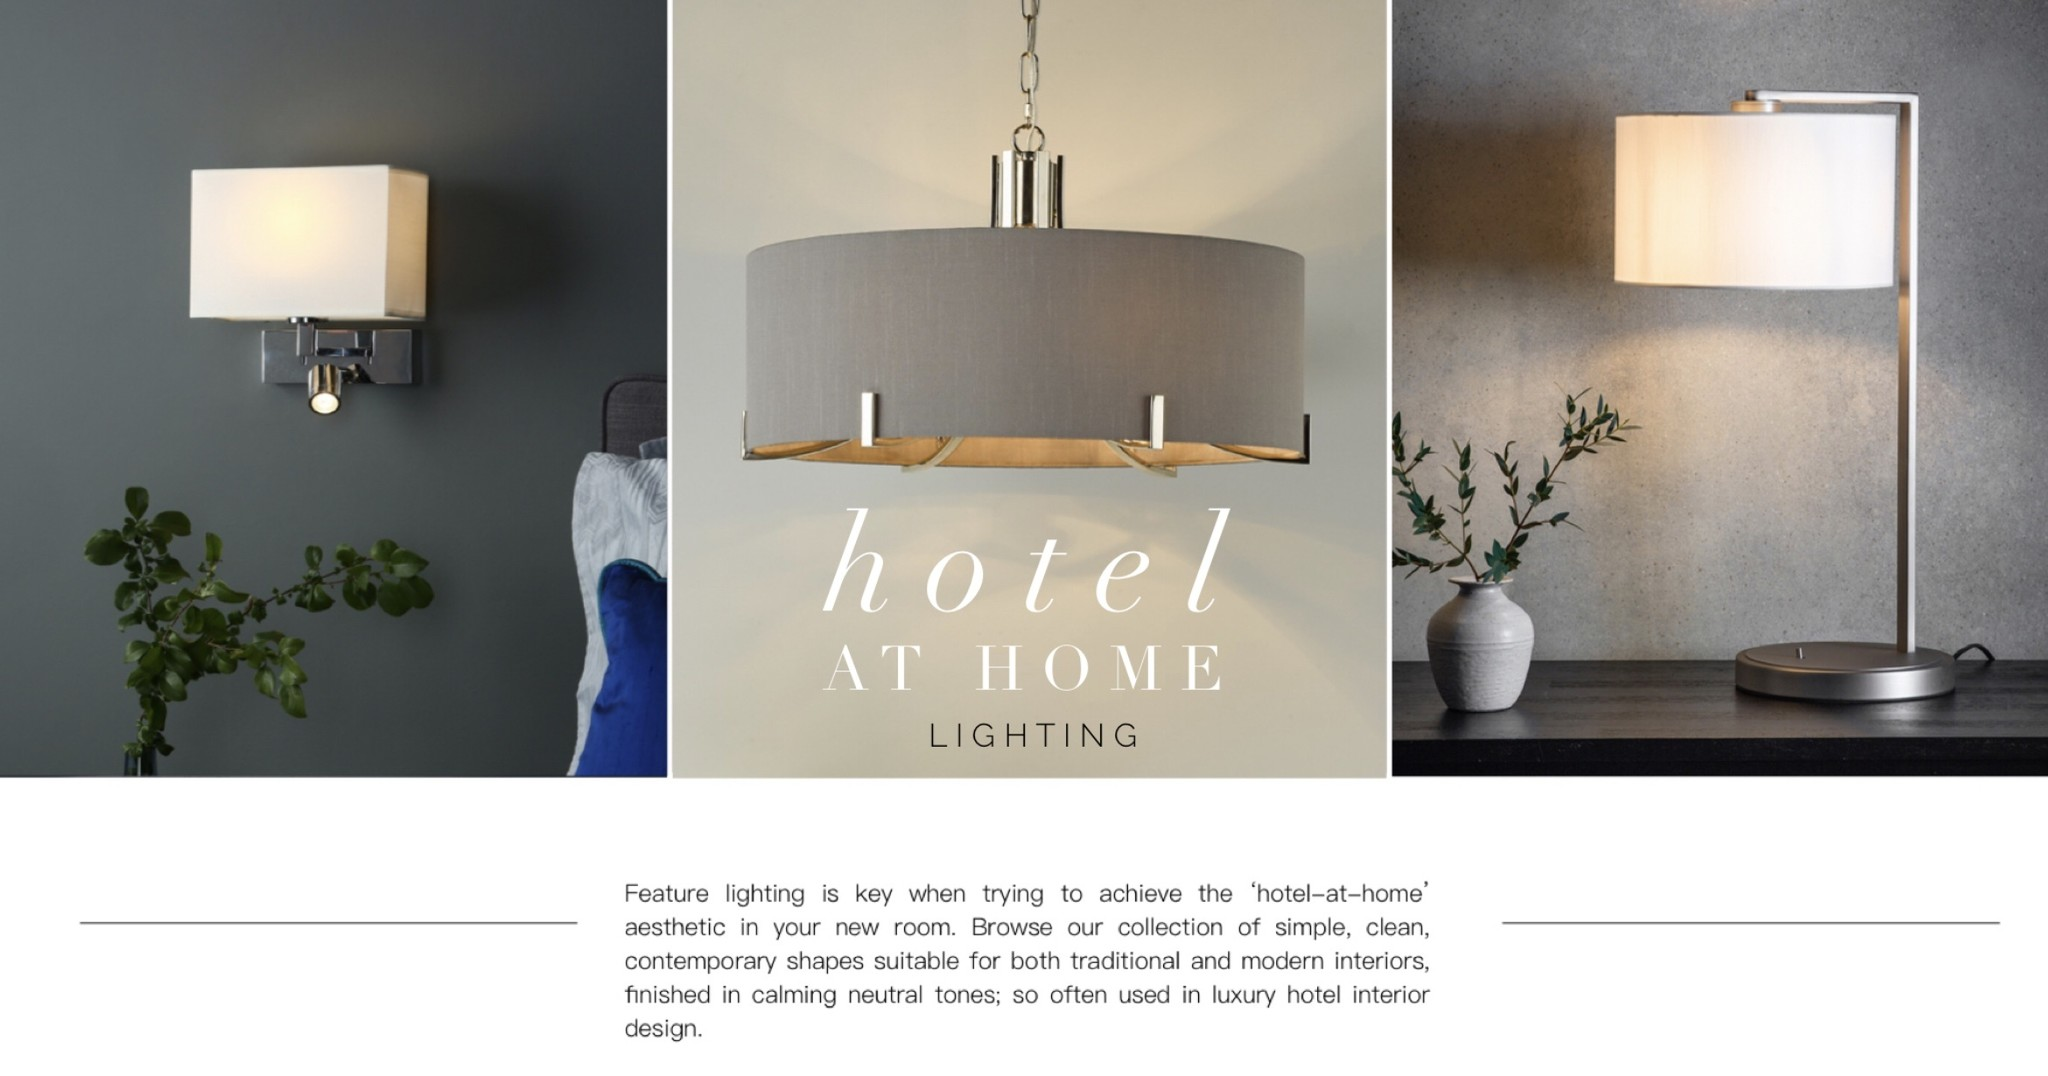 Hotel style lighting